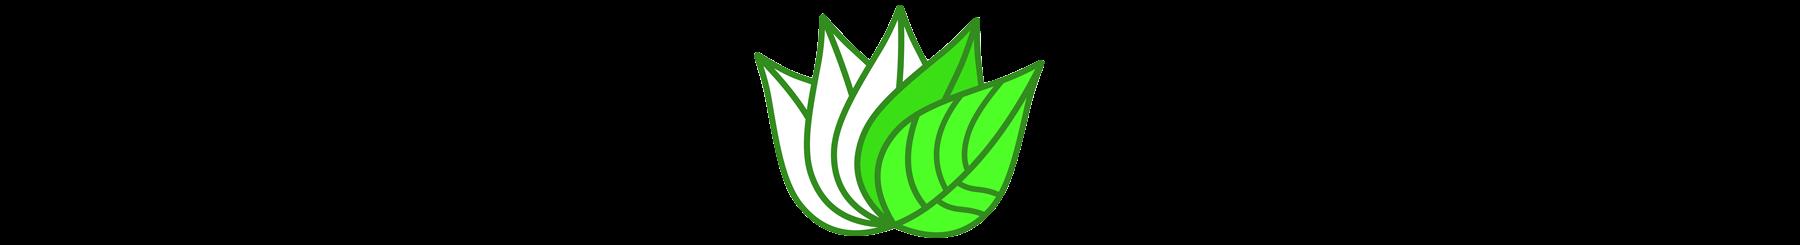 0_2 Leaf long.png